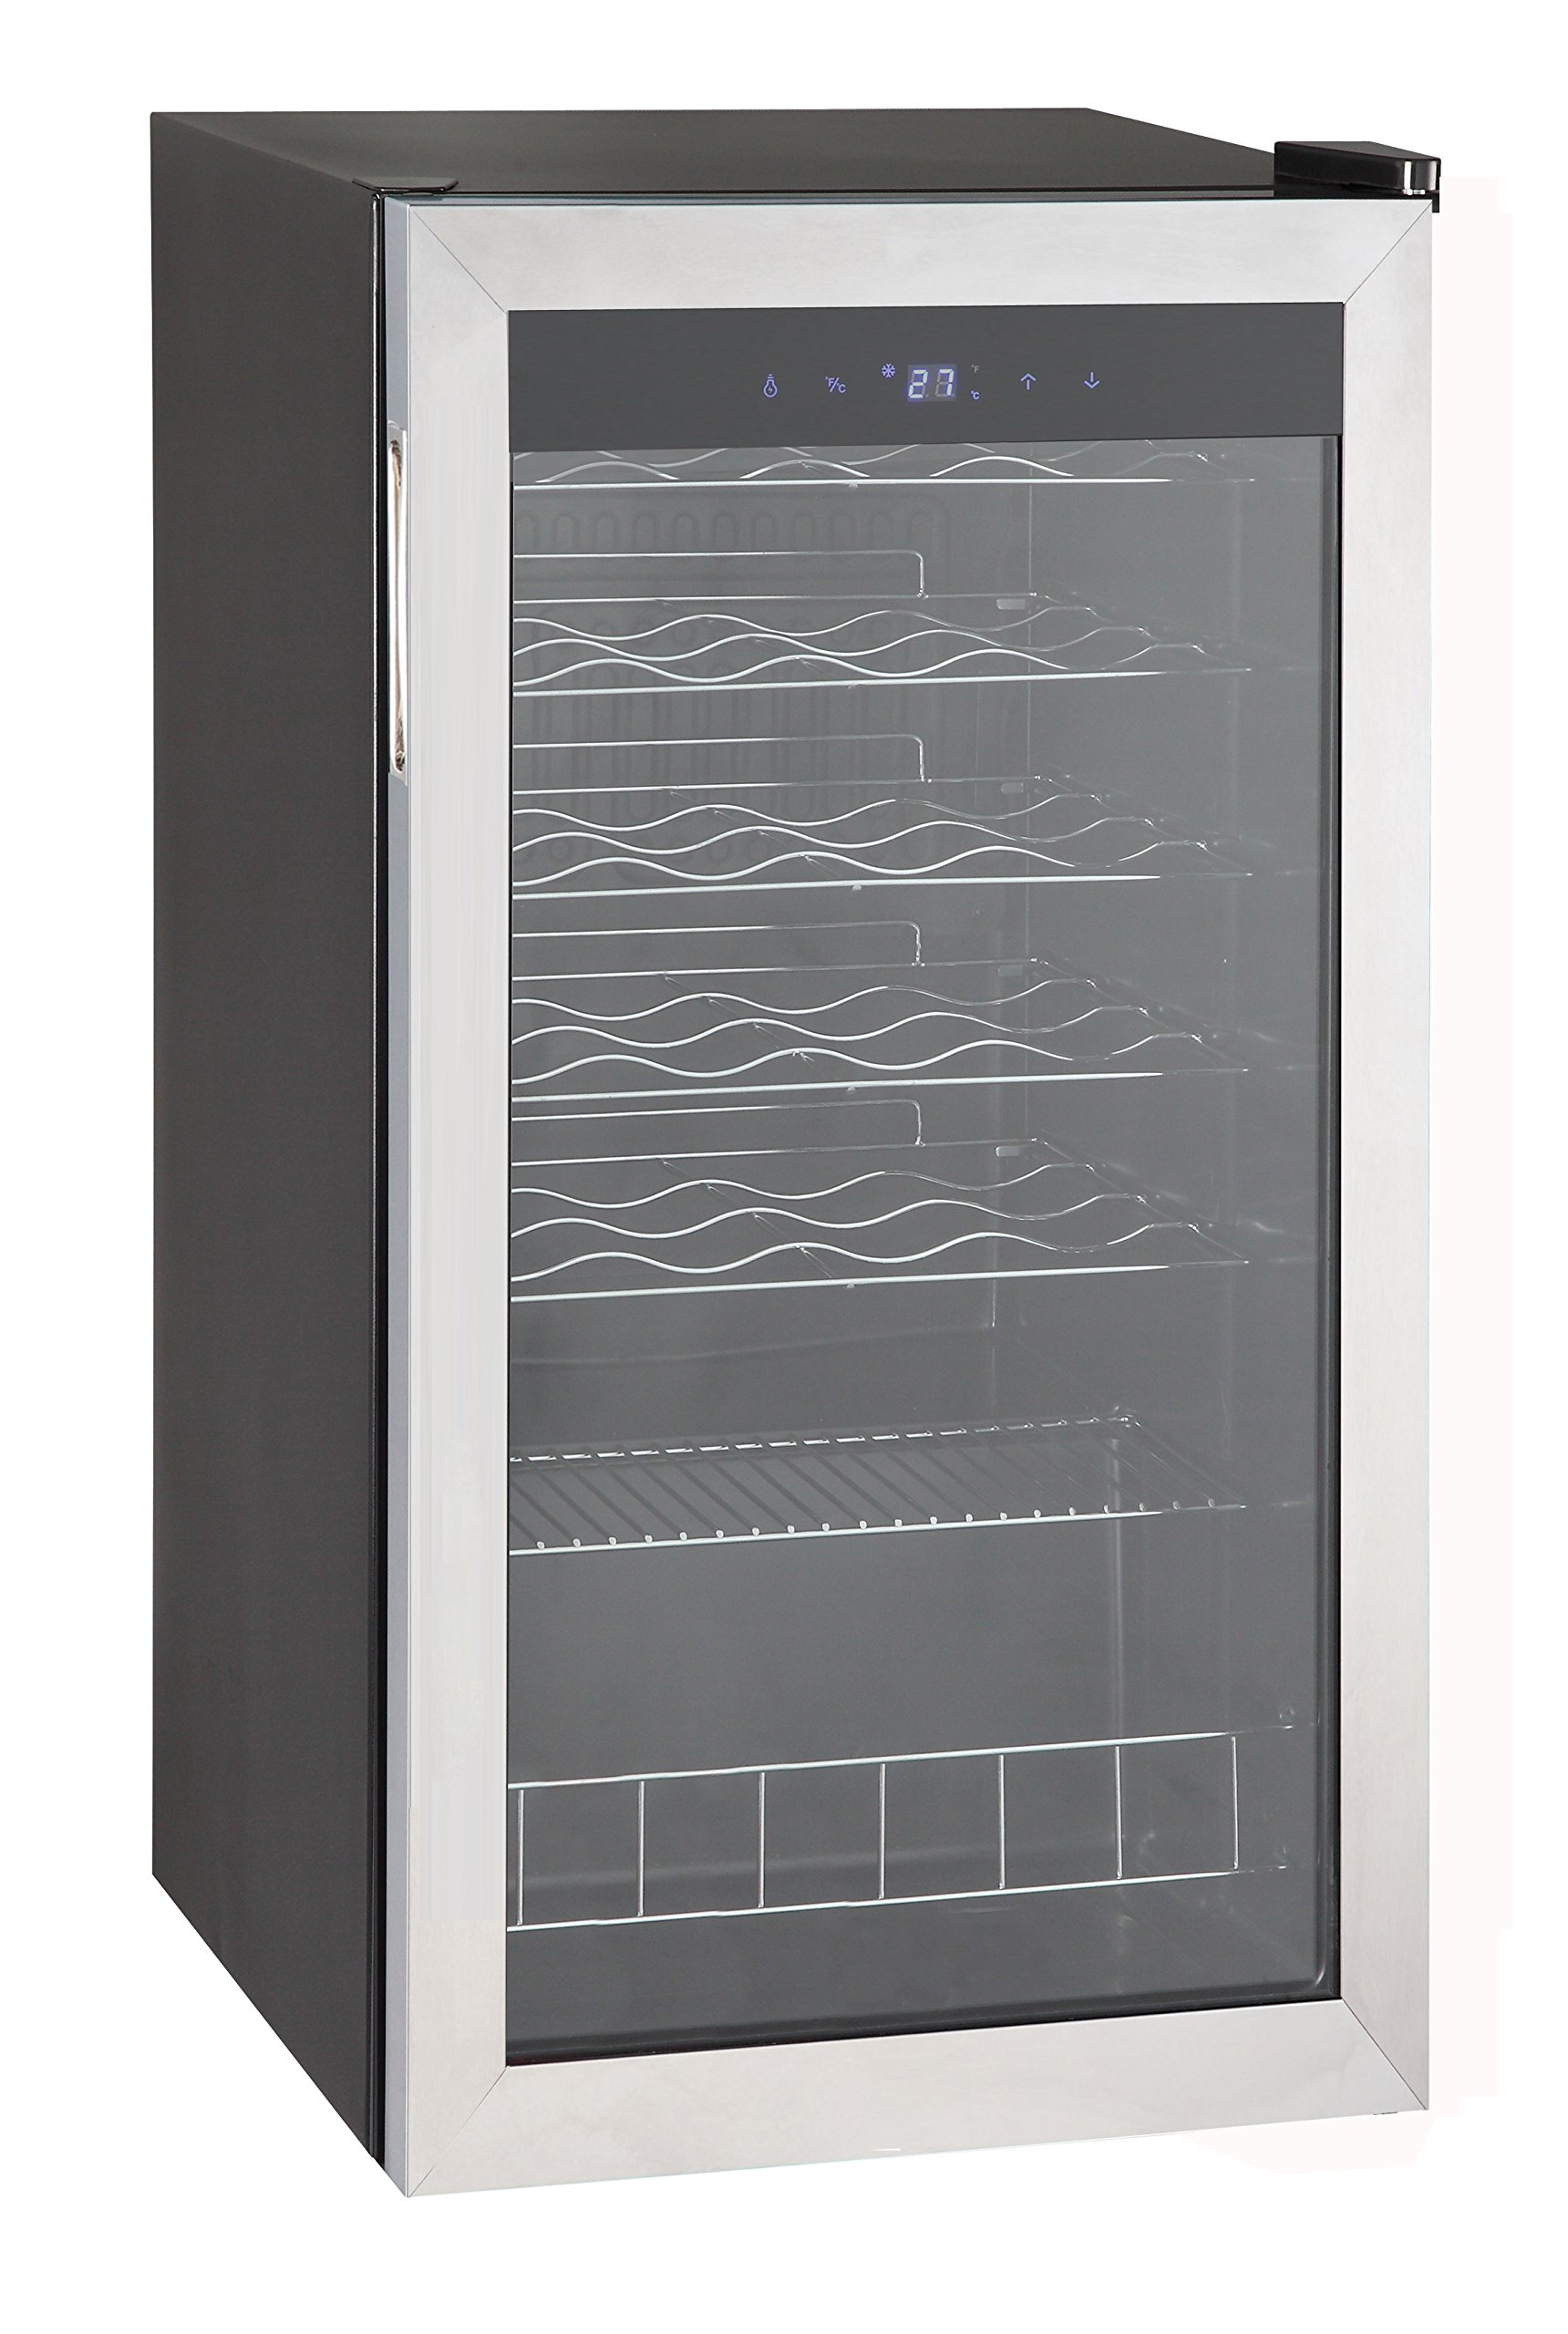 SMETA 3.1 cu ft 28 Bottles Wine Refrigerator with Stainless Steel Door Wine Cellar Fridge Freestanding Champagne Cooler